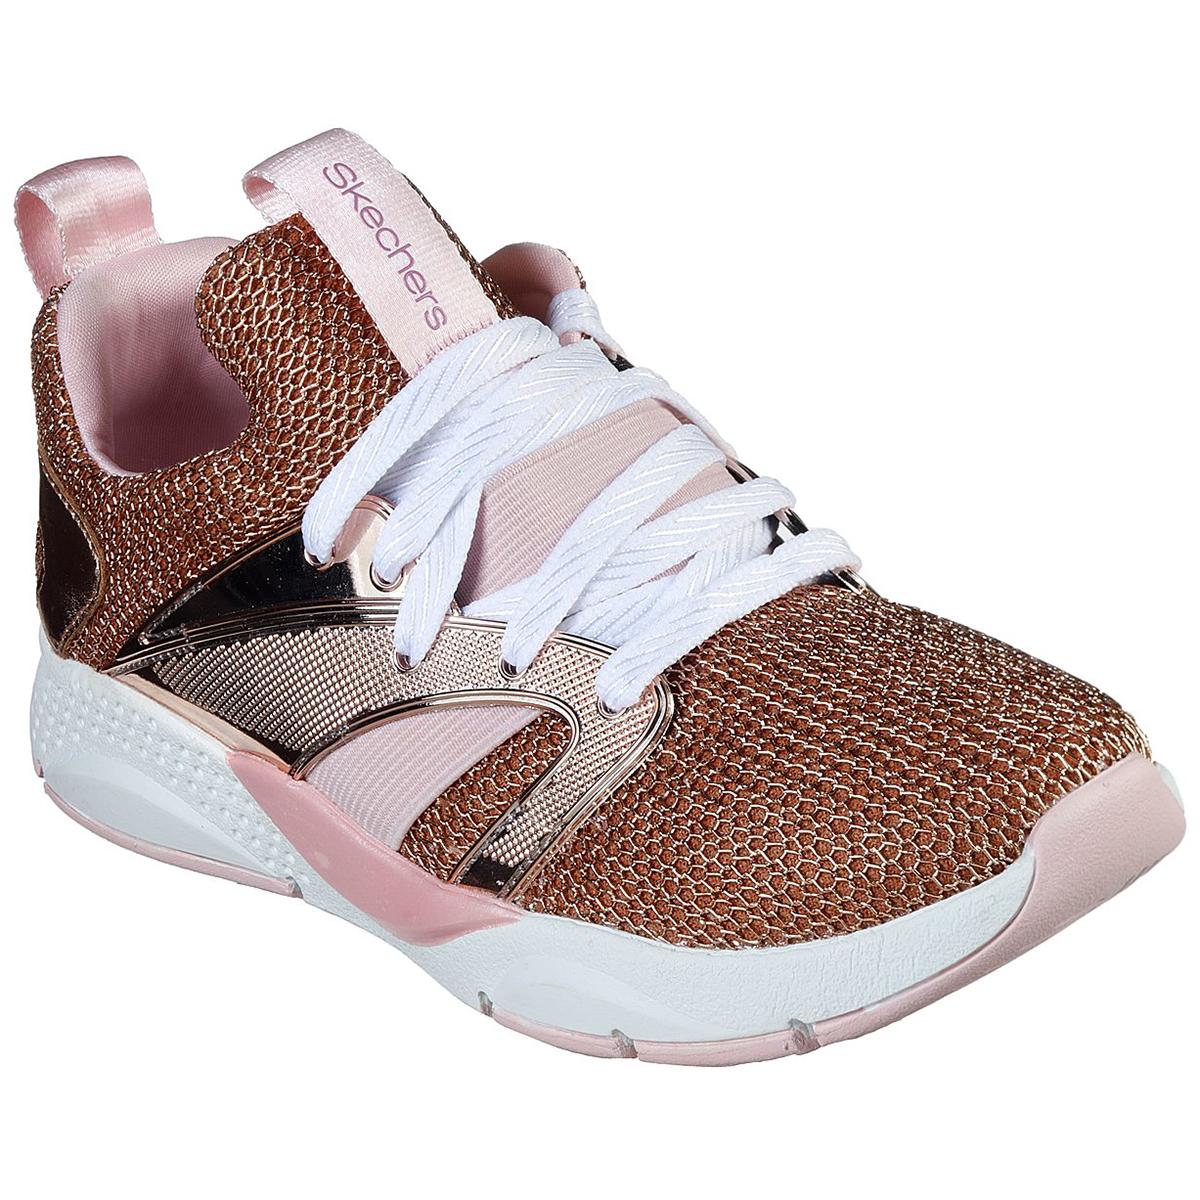 Skechers Girls' Shine Status Sneaker - Red, 1